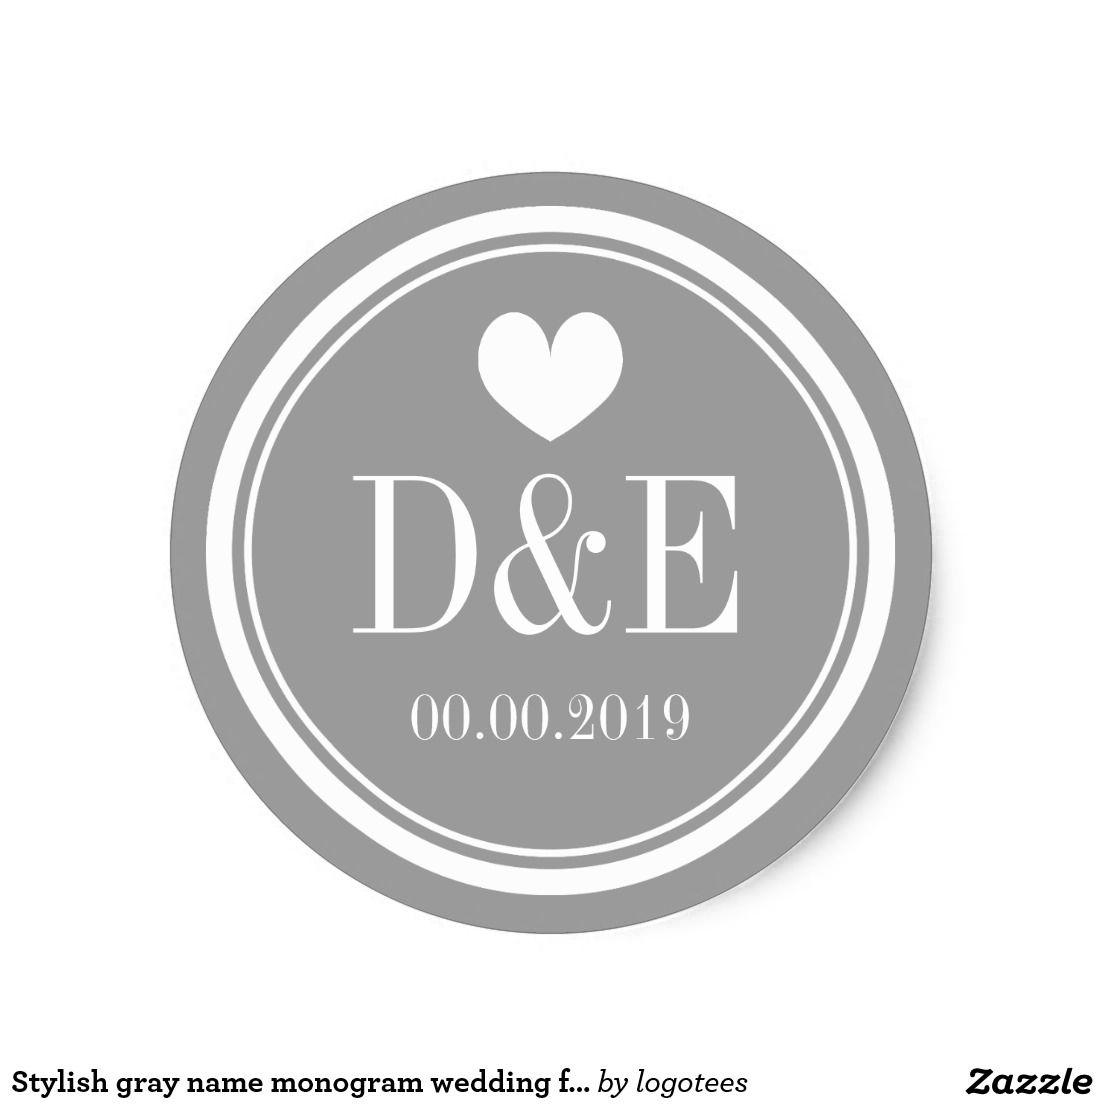 Stylish gray name monogram wedding favor stickers   wedding favor ...